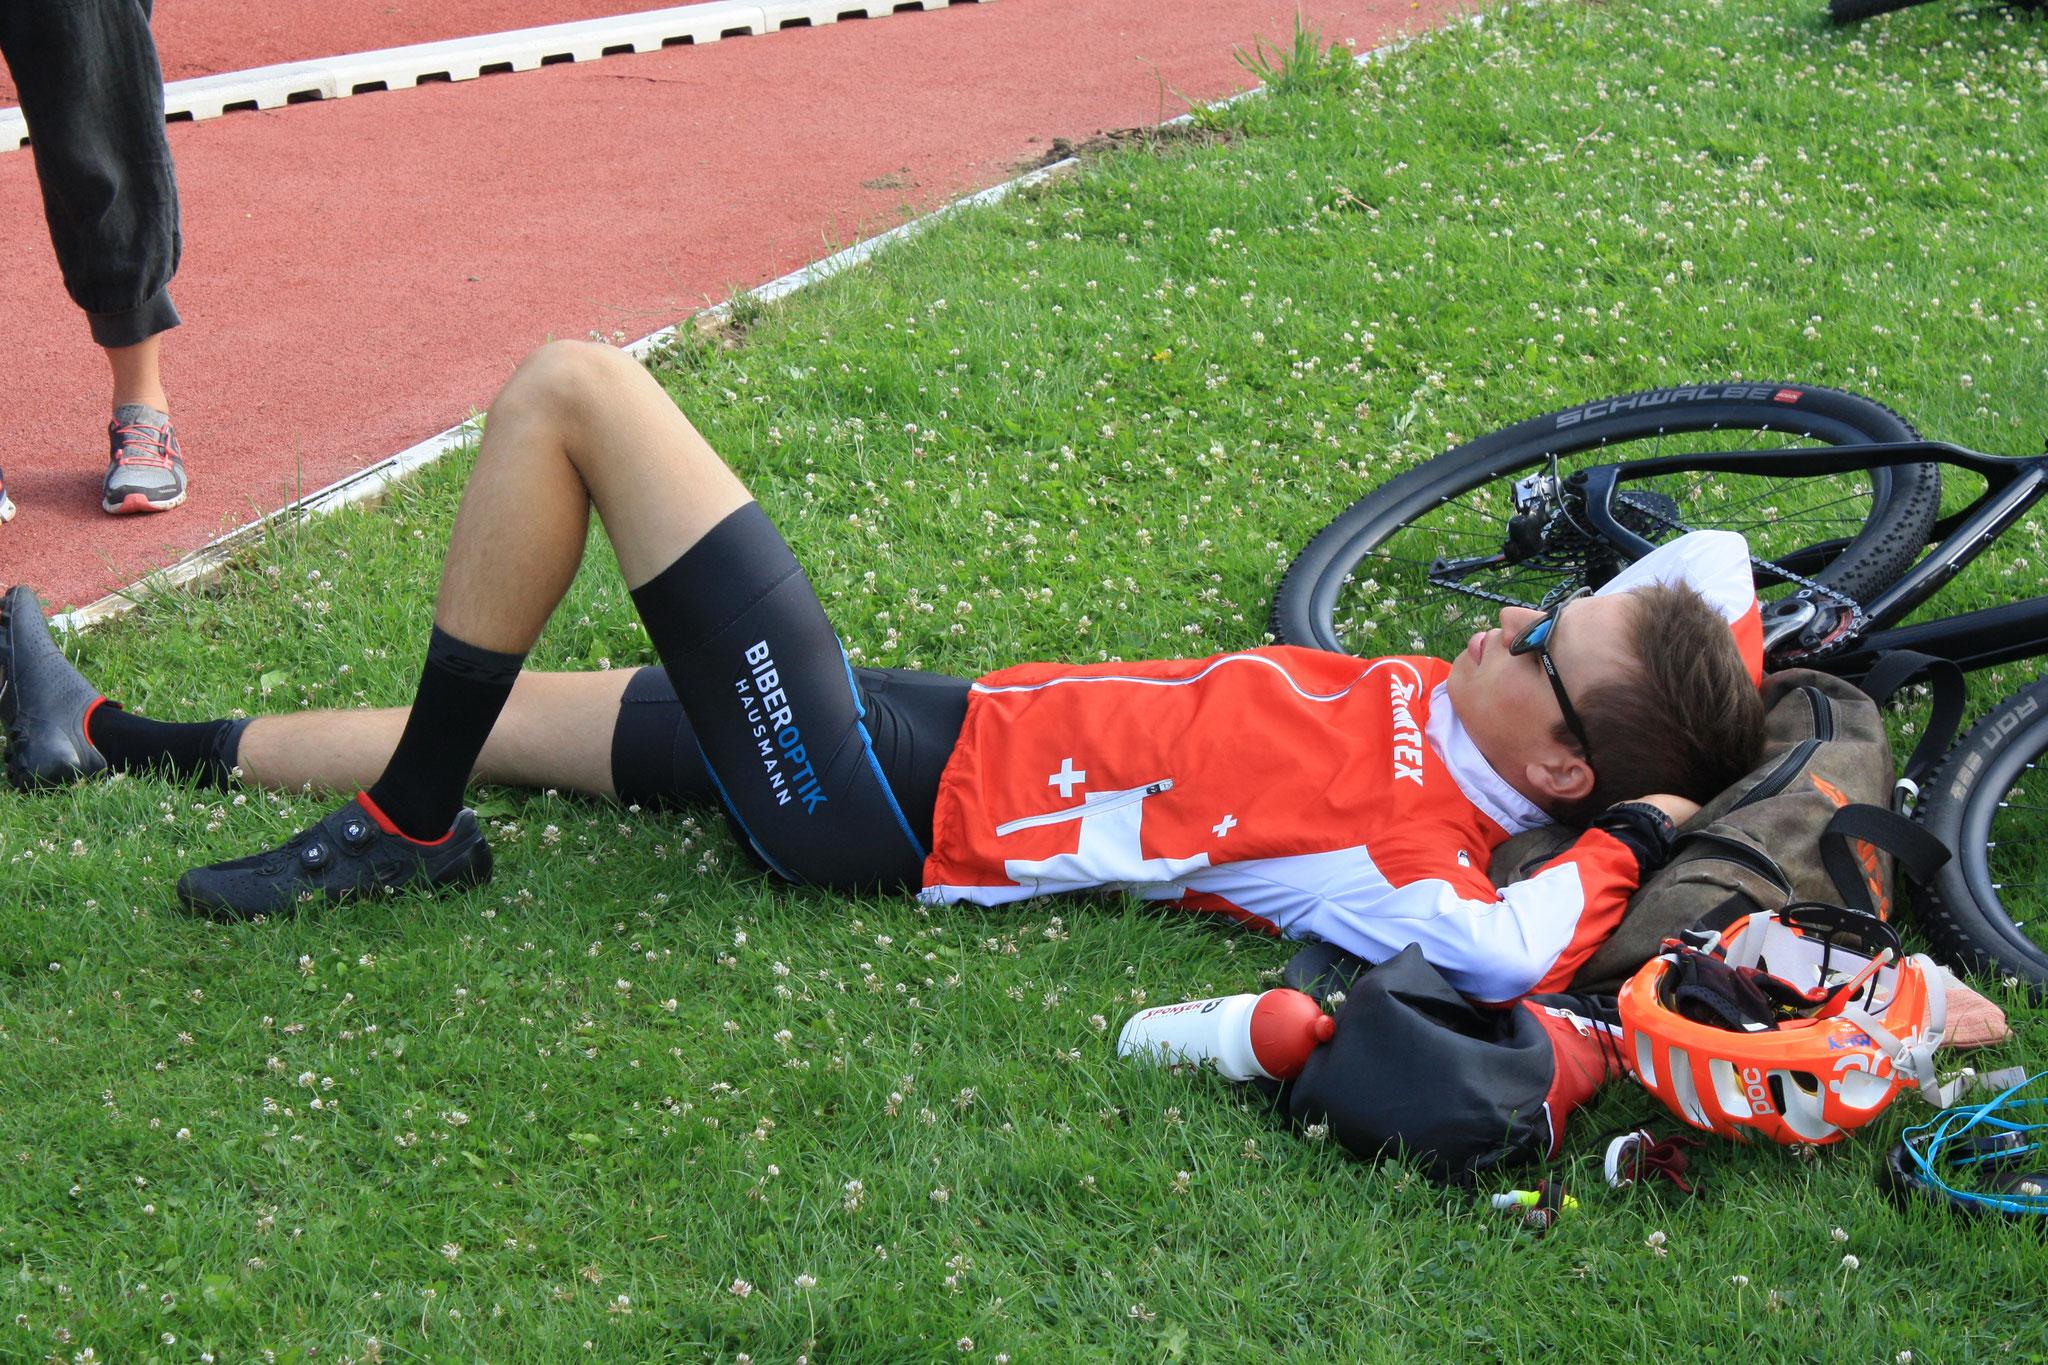 Seriöse Vorbereitung auf den Sprint (Thomas Jäggi)